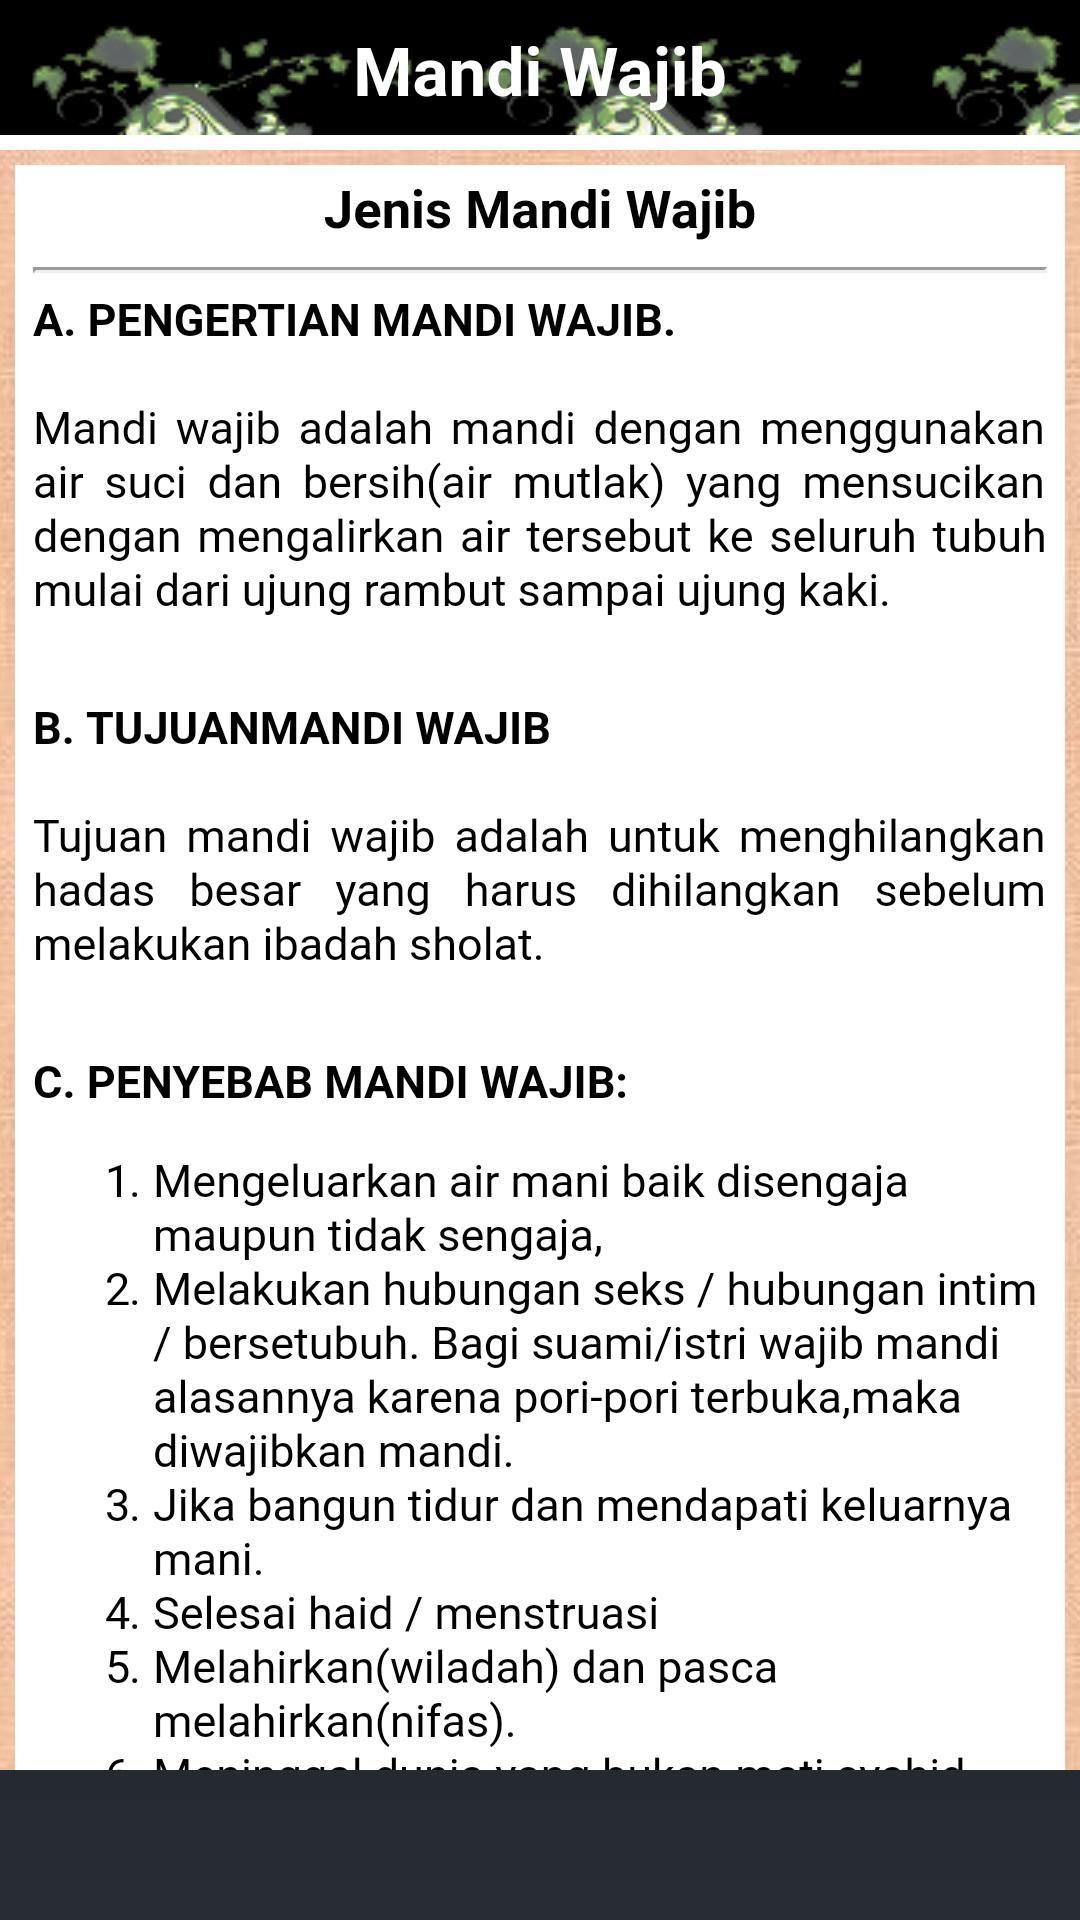 Tata Cara Mandi Wajib Dan Niatnya Yang Benar安卓下载 安卓版apk 免费下载